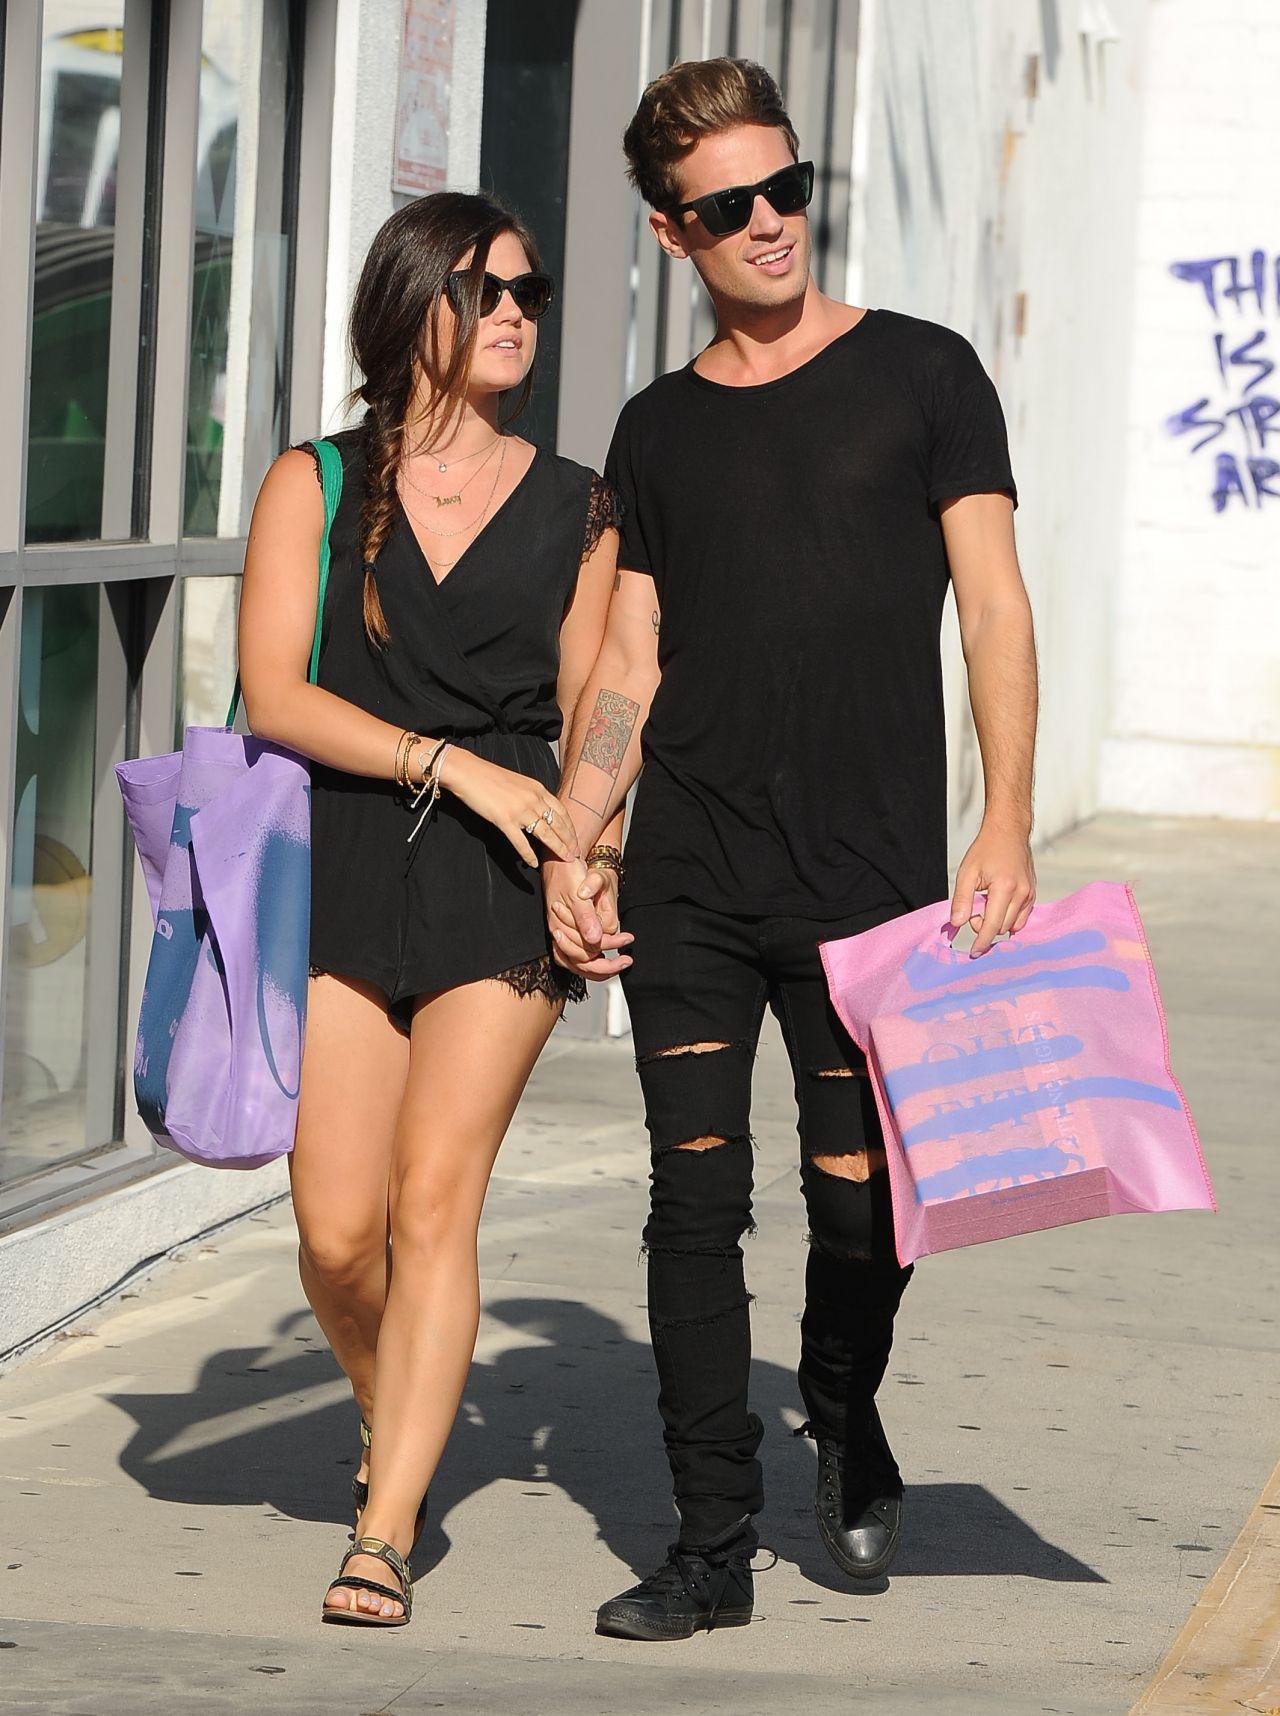 Lucy Hale & Her Boyfriend Shopping in Beverly Hills - September 2014